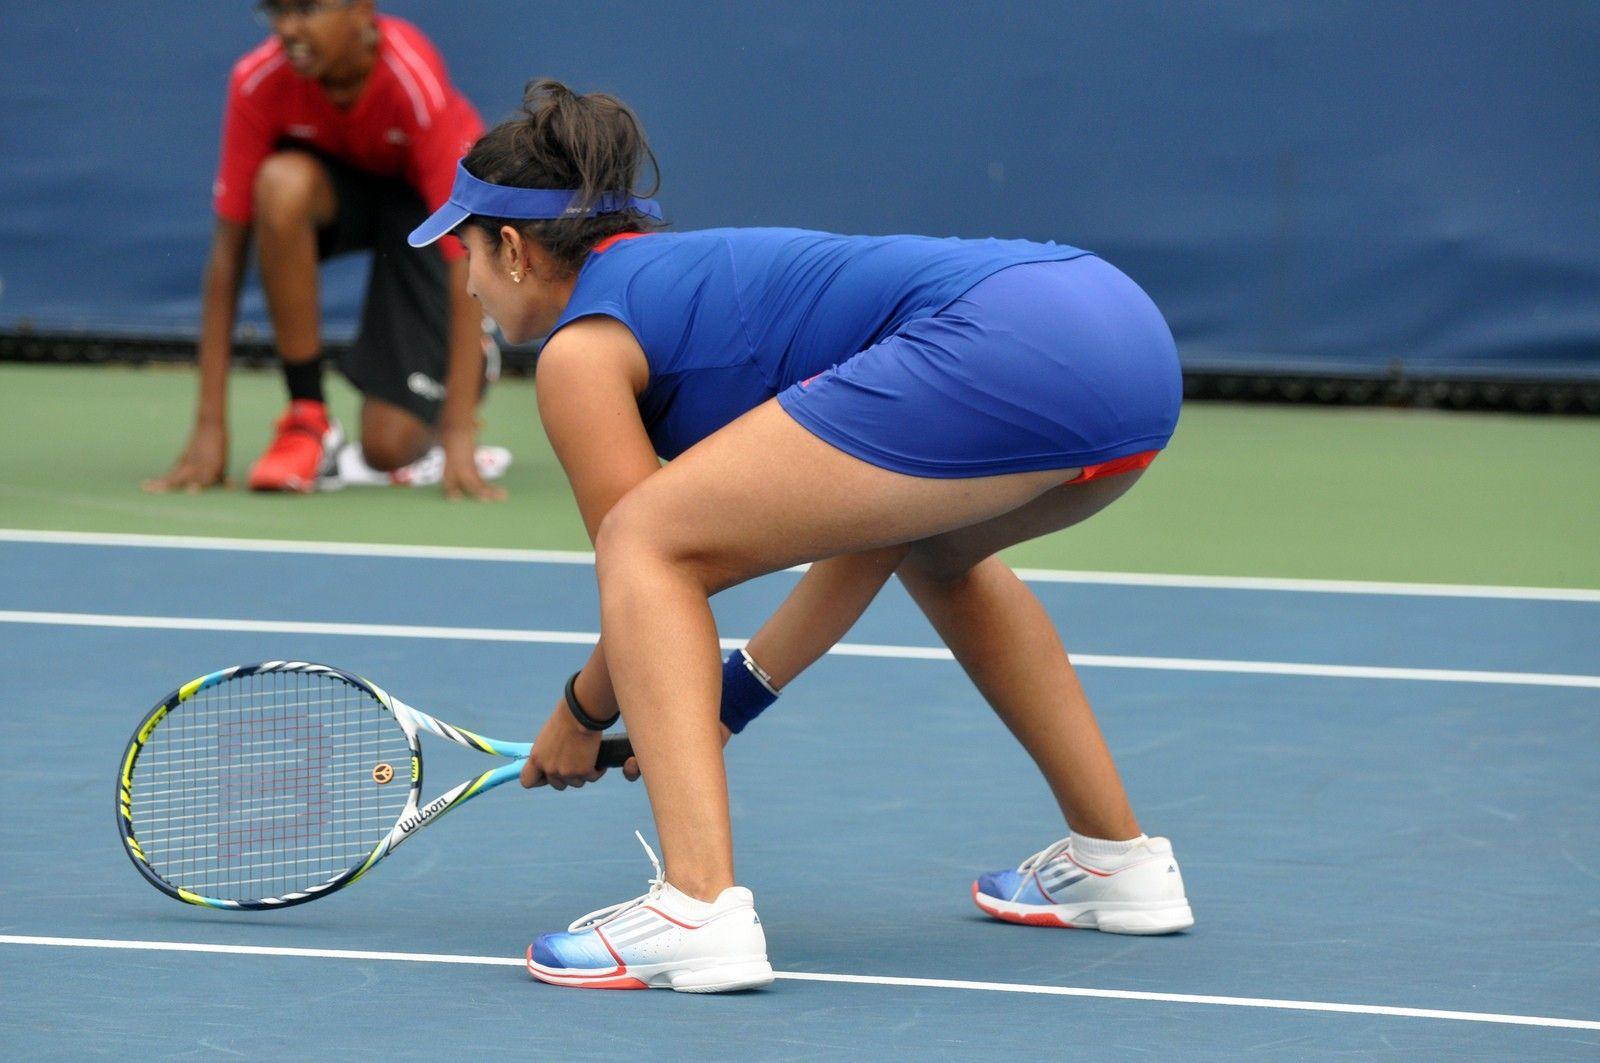 Indian Tennis Player Sania Mirza Hot Photos In White T